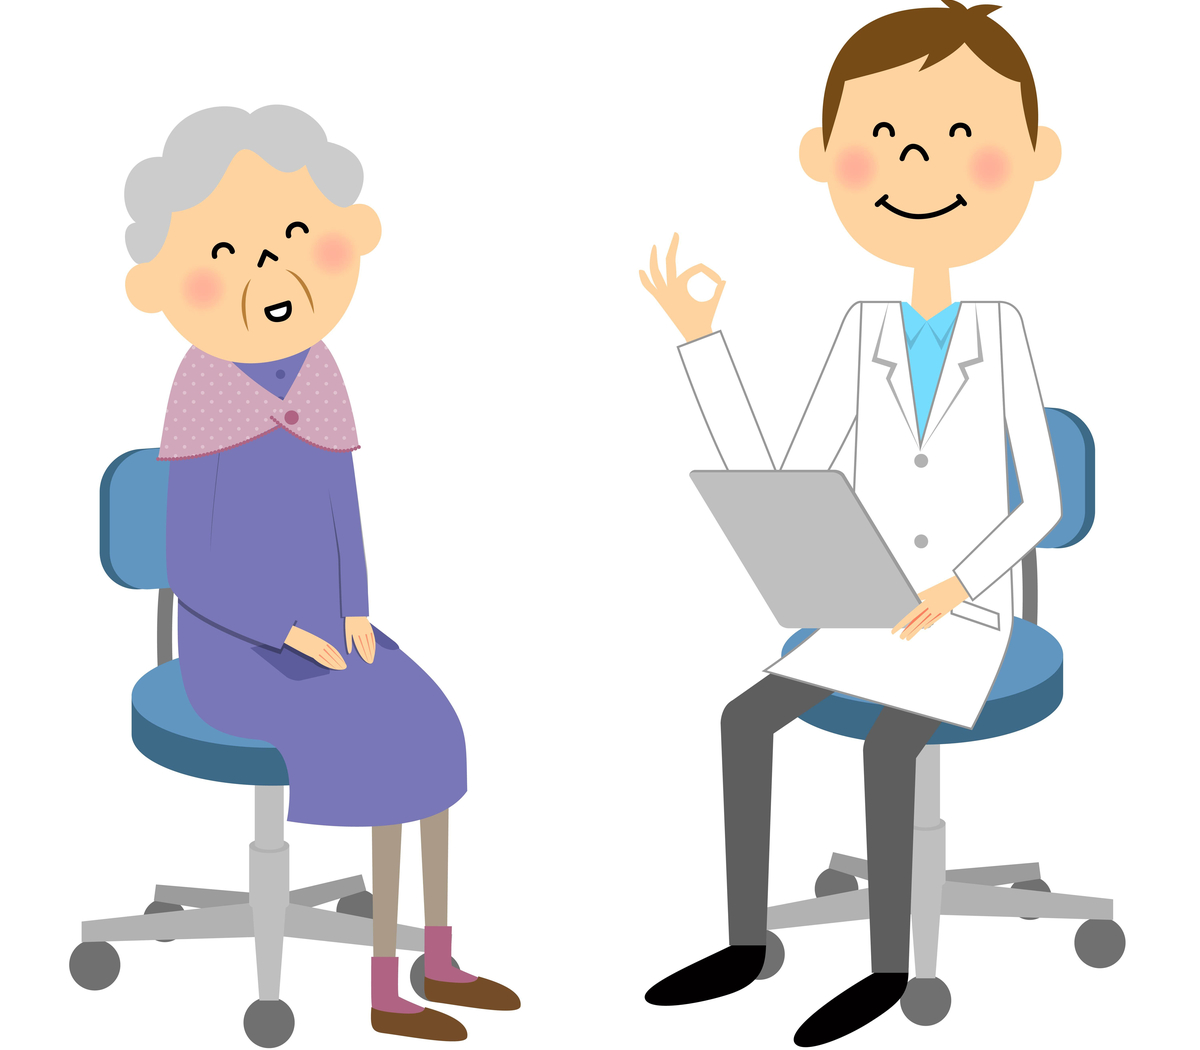 analize medicale dupa 60 de ani. Medicul ii spune unei femei in varsta ca analizele i-au iesit ok